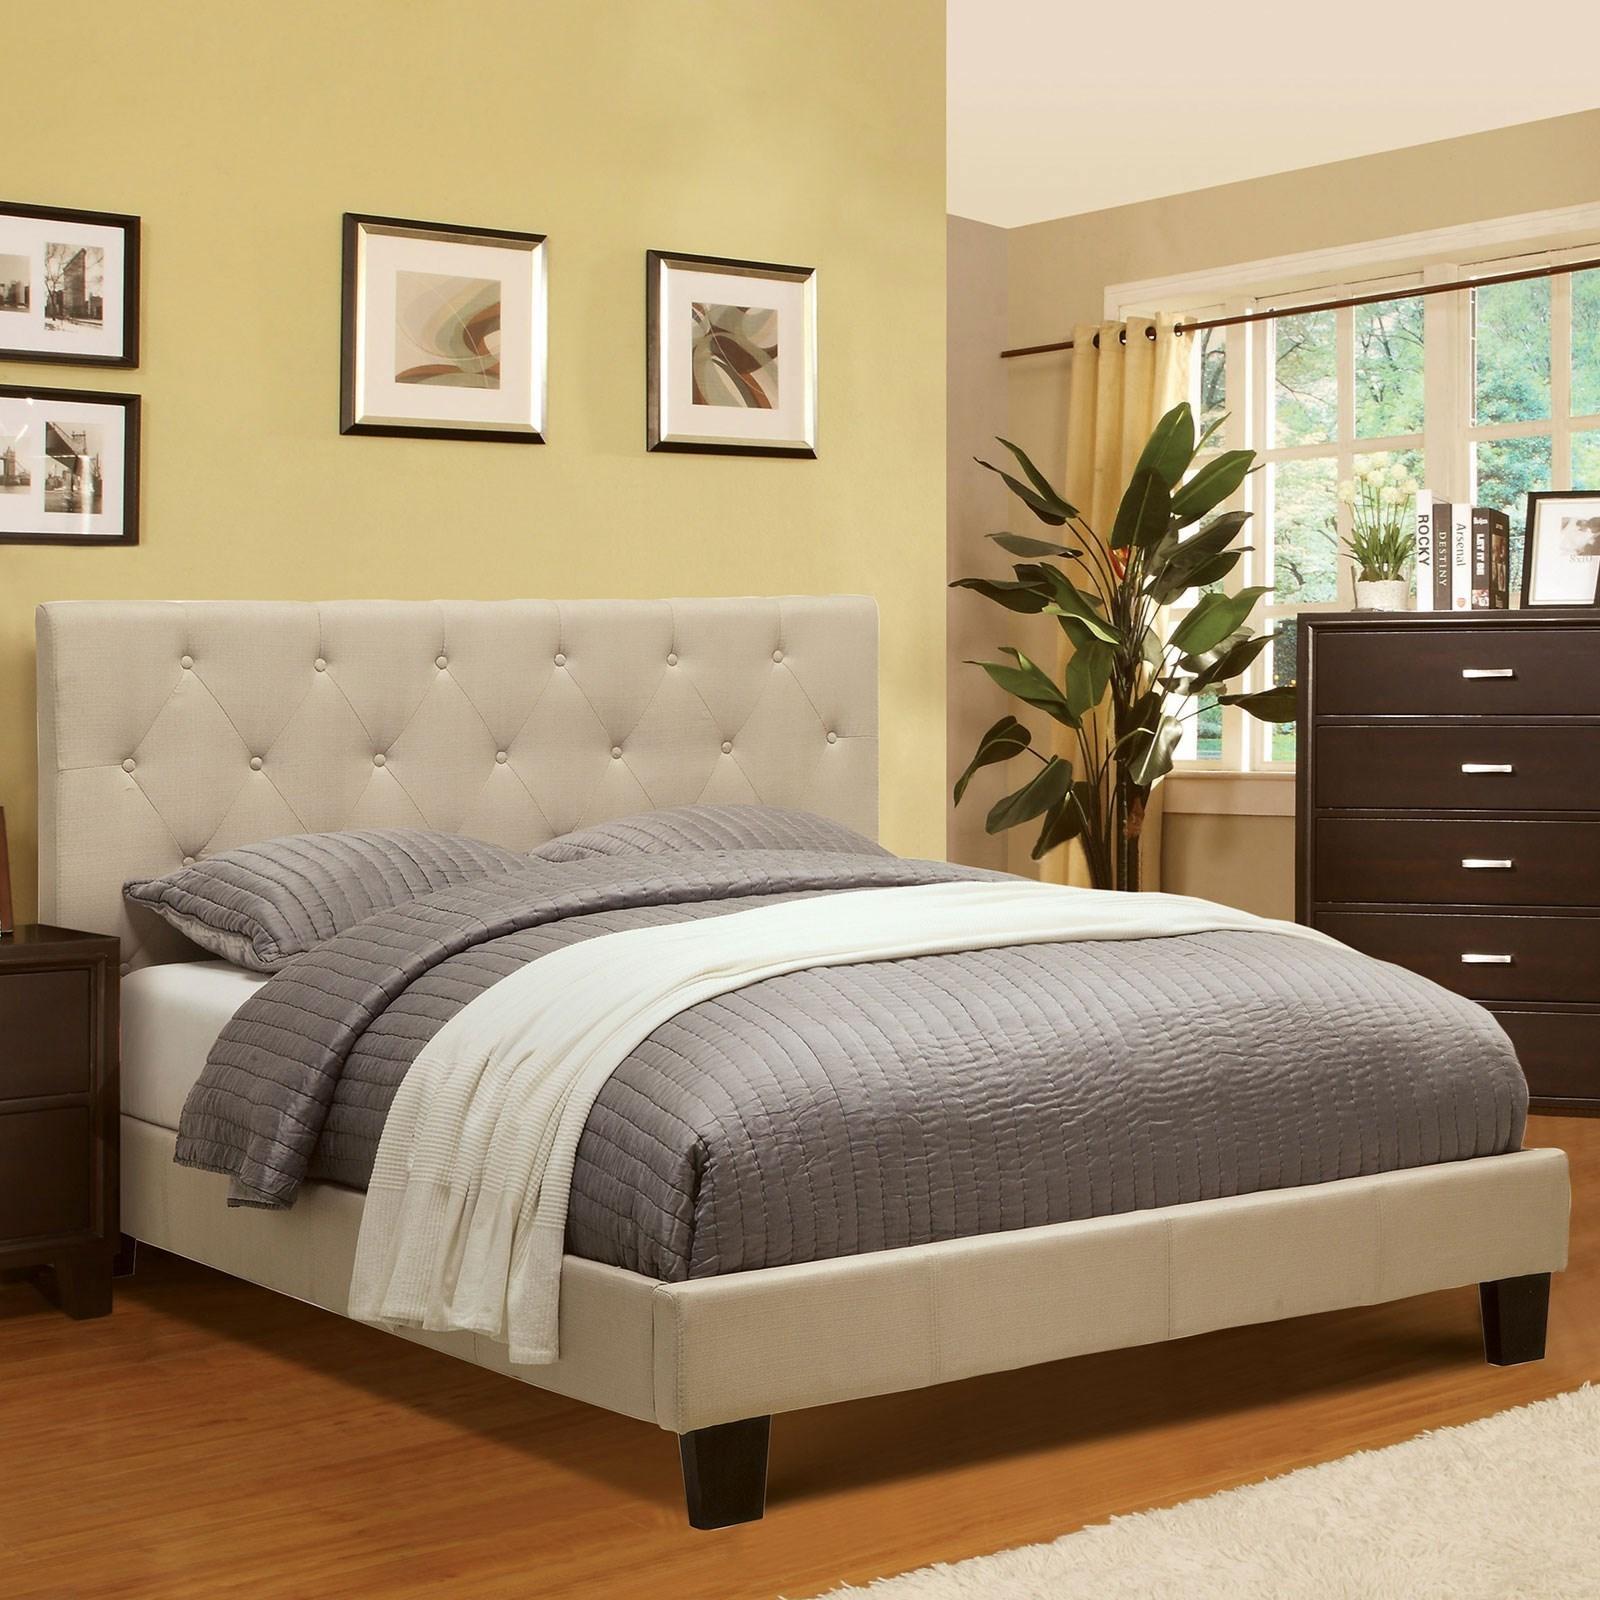 Full Upholstered Platform Bed